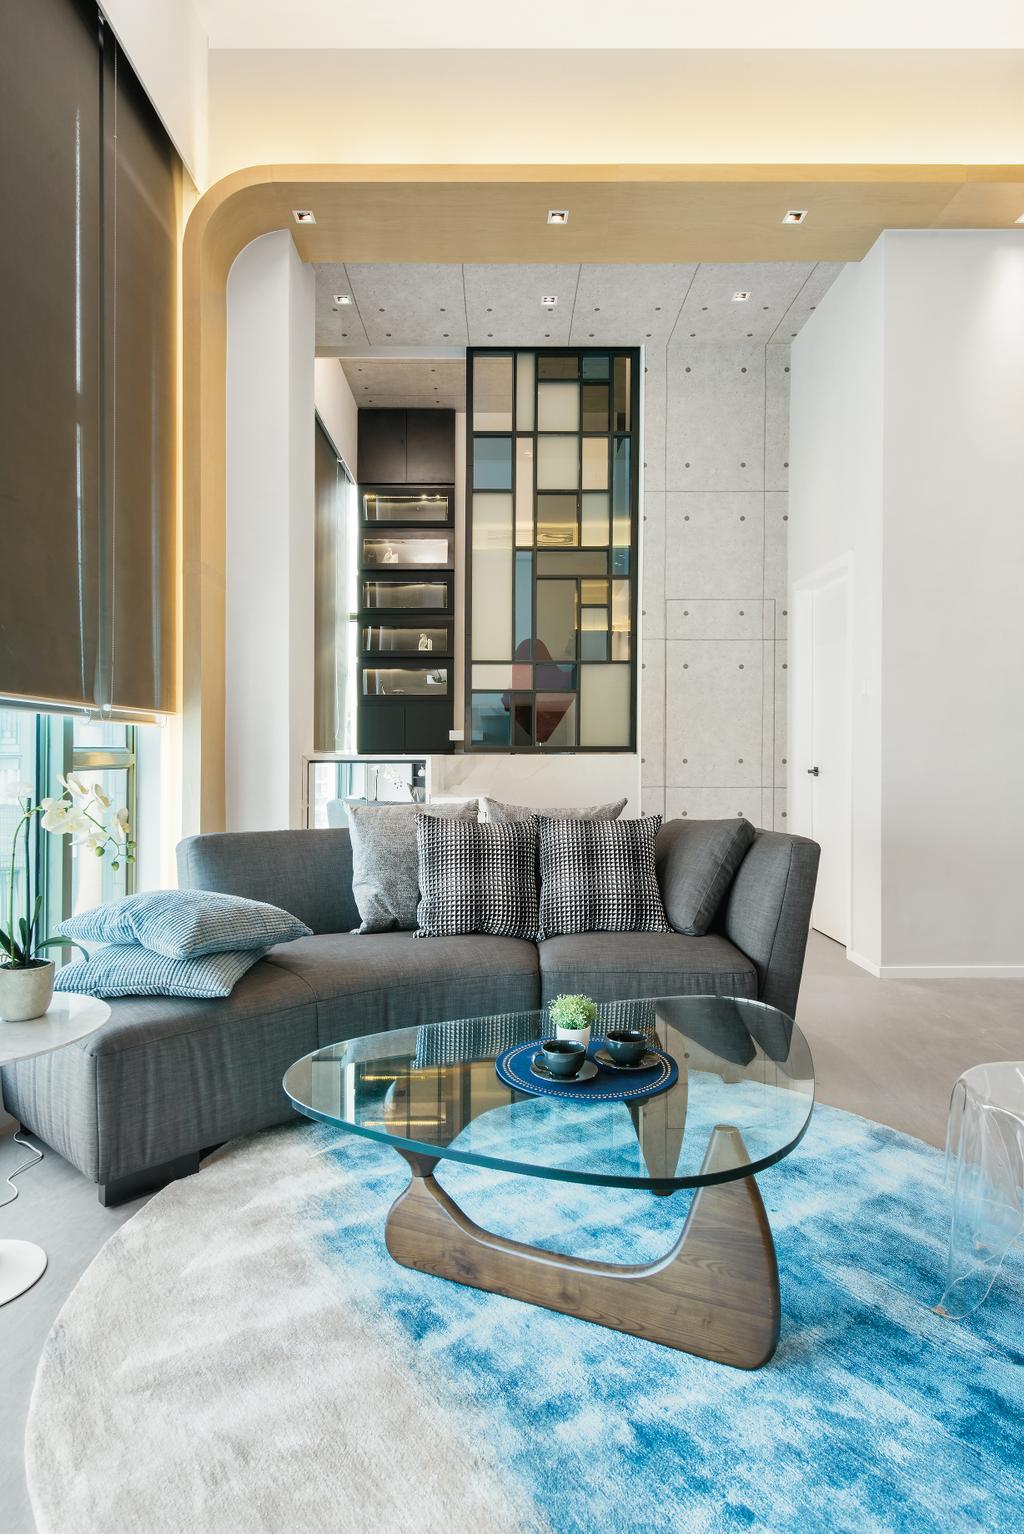 摩登, 私家樓, 九龍西, 室內設計師, 畫斯室內設計, 工業, Couch, Furniture, Indoors, Interior Design, 客廳, Room